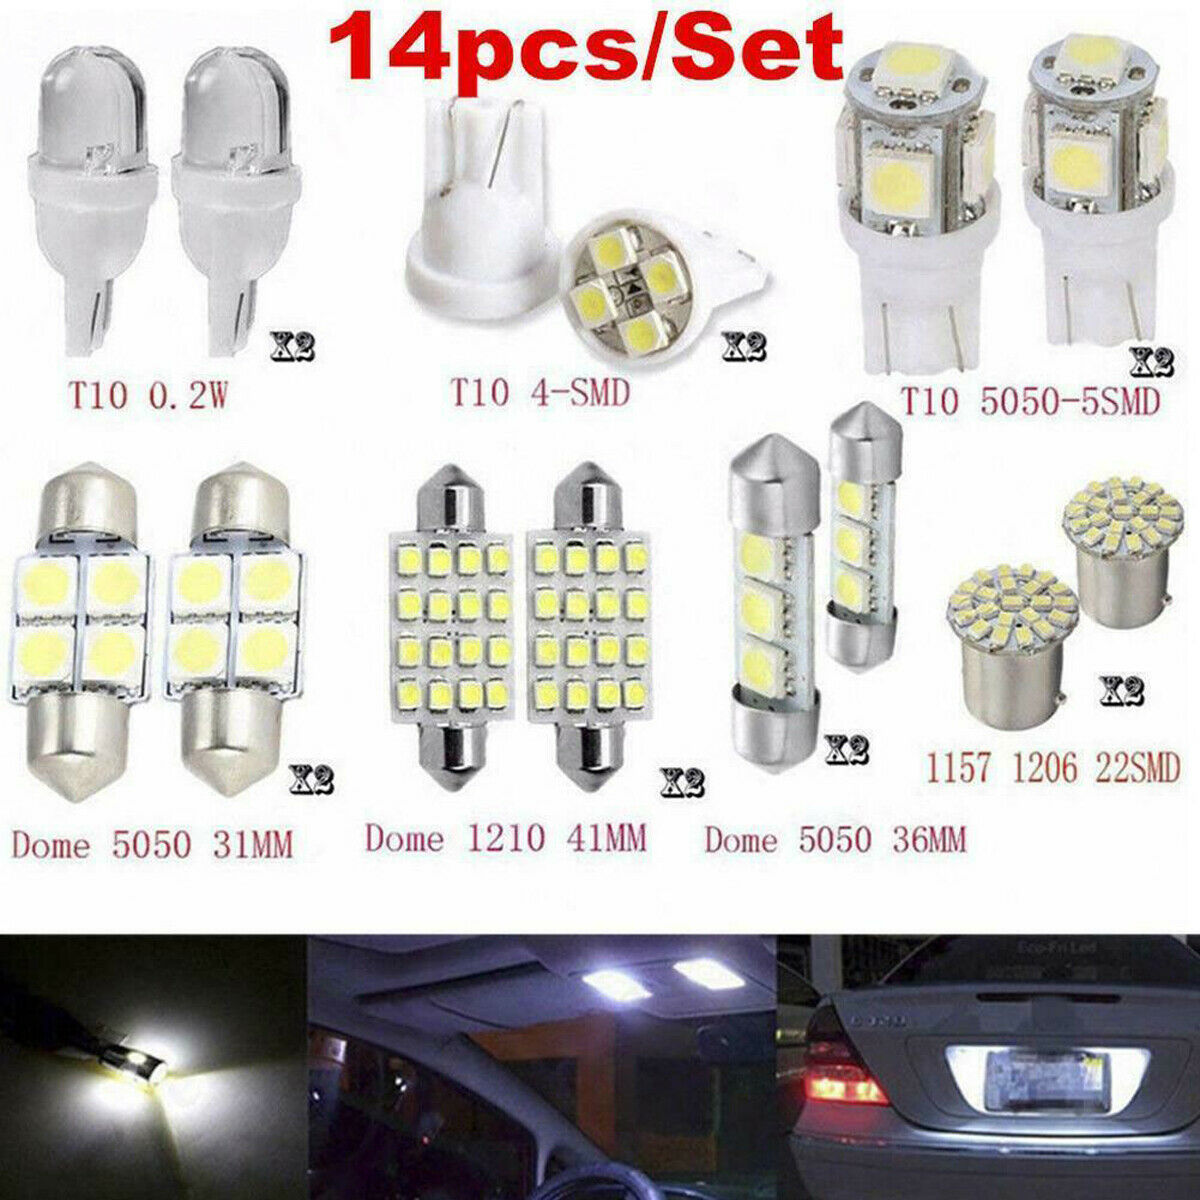 luz-led-mixta-para-matricula-de-coche-kit-de-accesorios-para-interior-de-automovil-paquete-de-mapa-14x